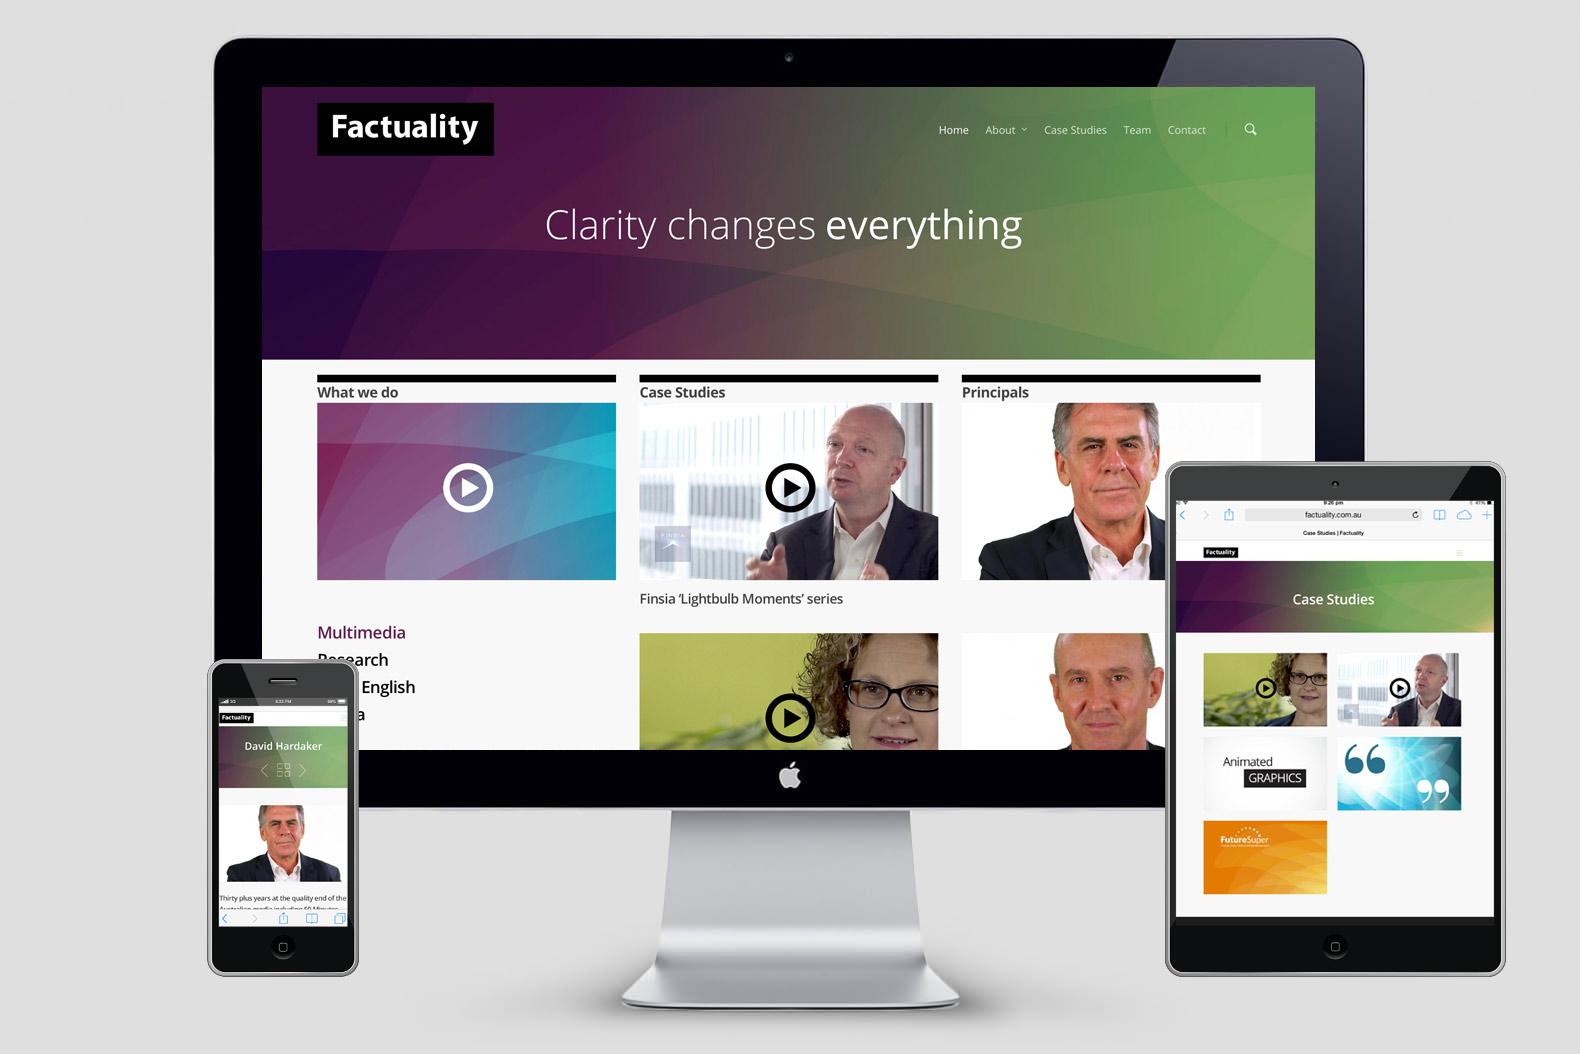 Factuality website